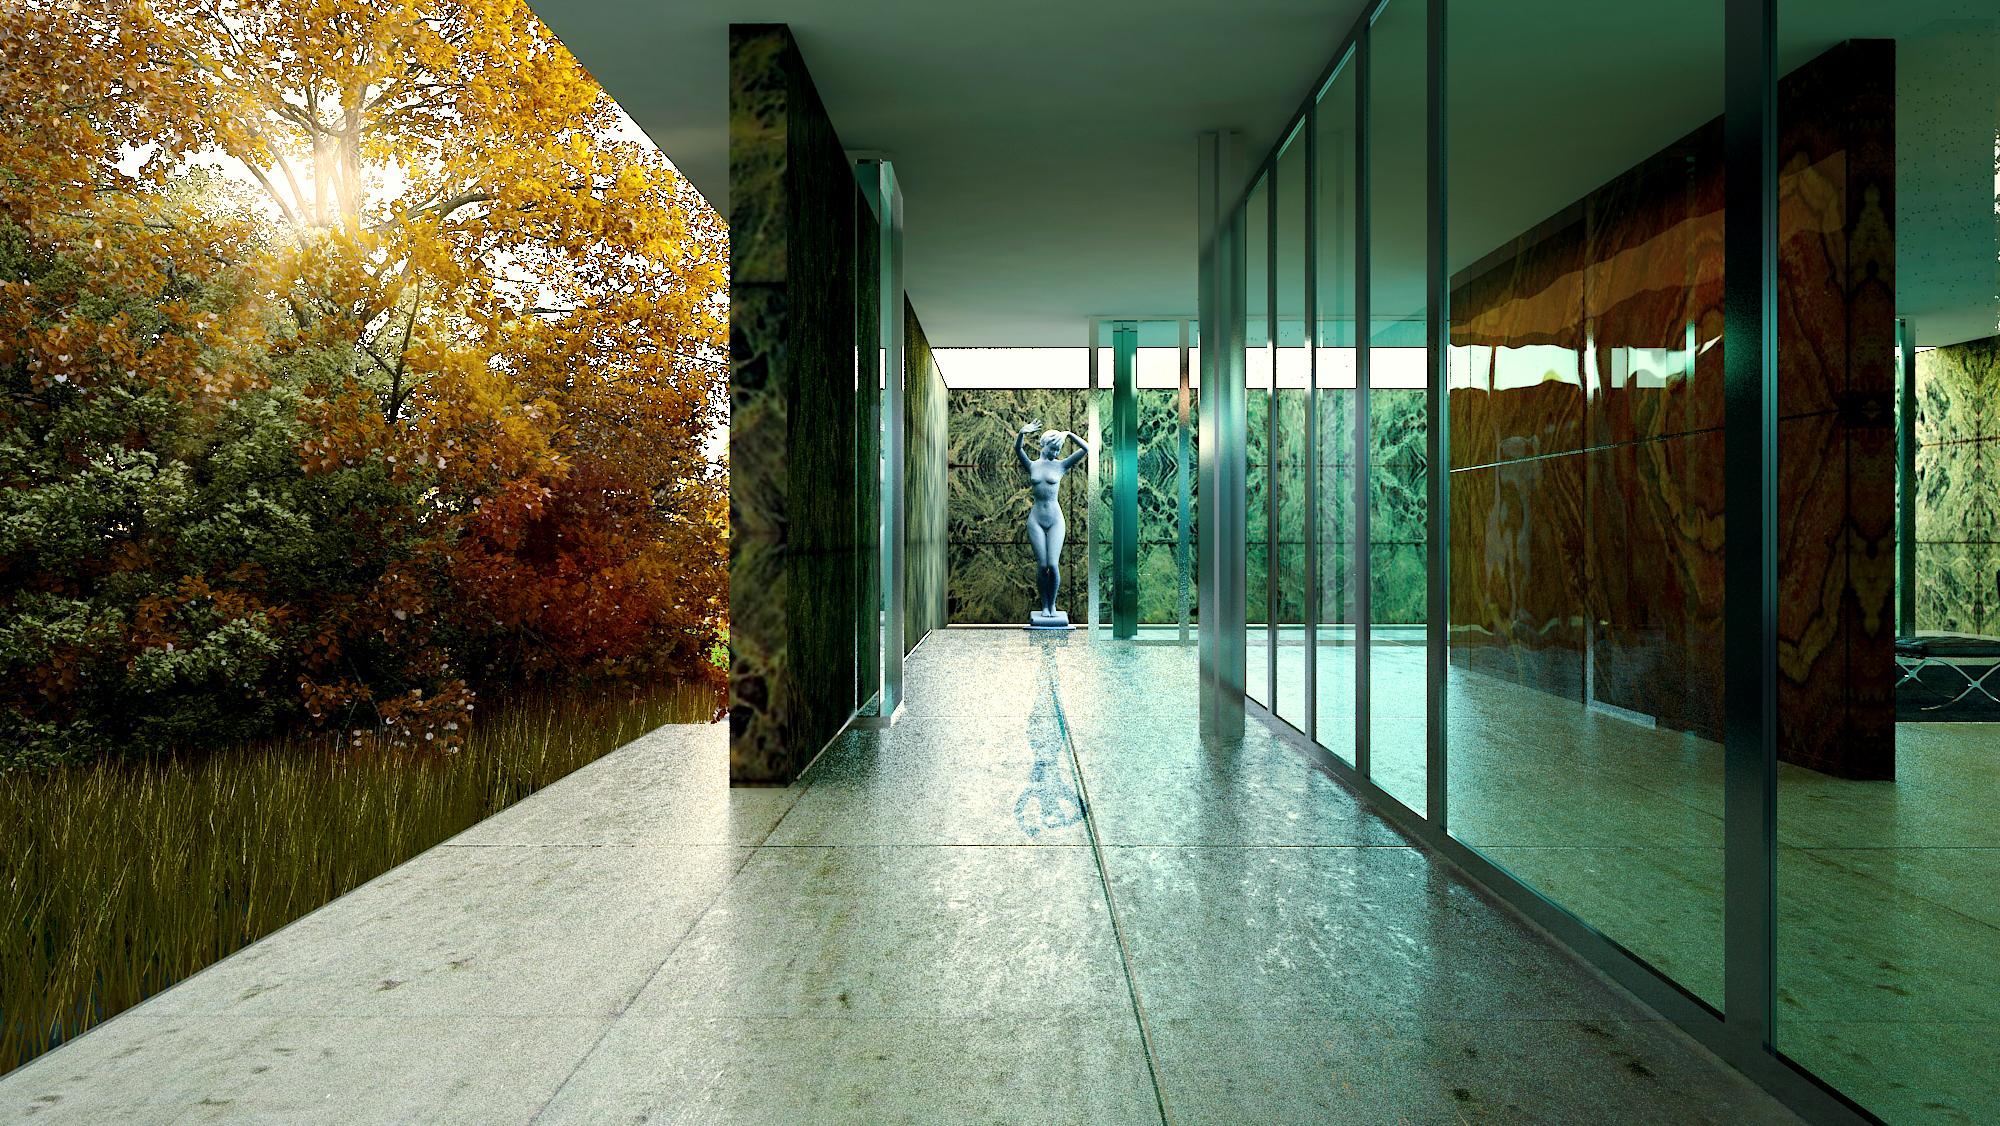 Barcelona pavilion exterior - Barcelona Pavilion Exterior 21